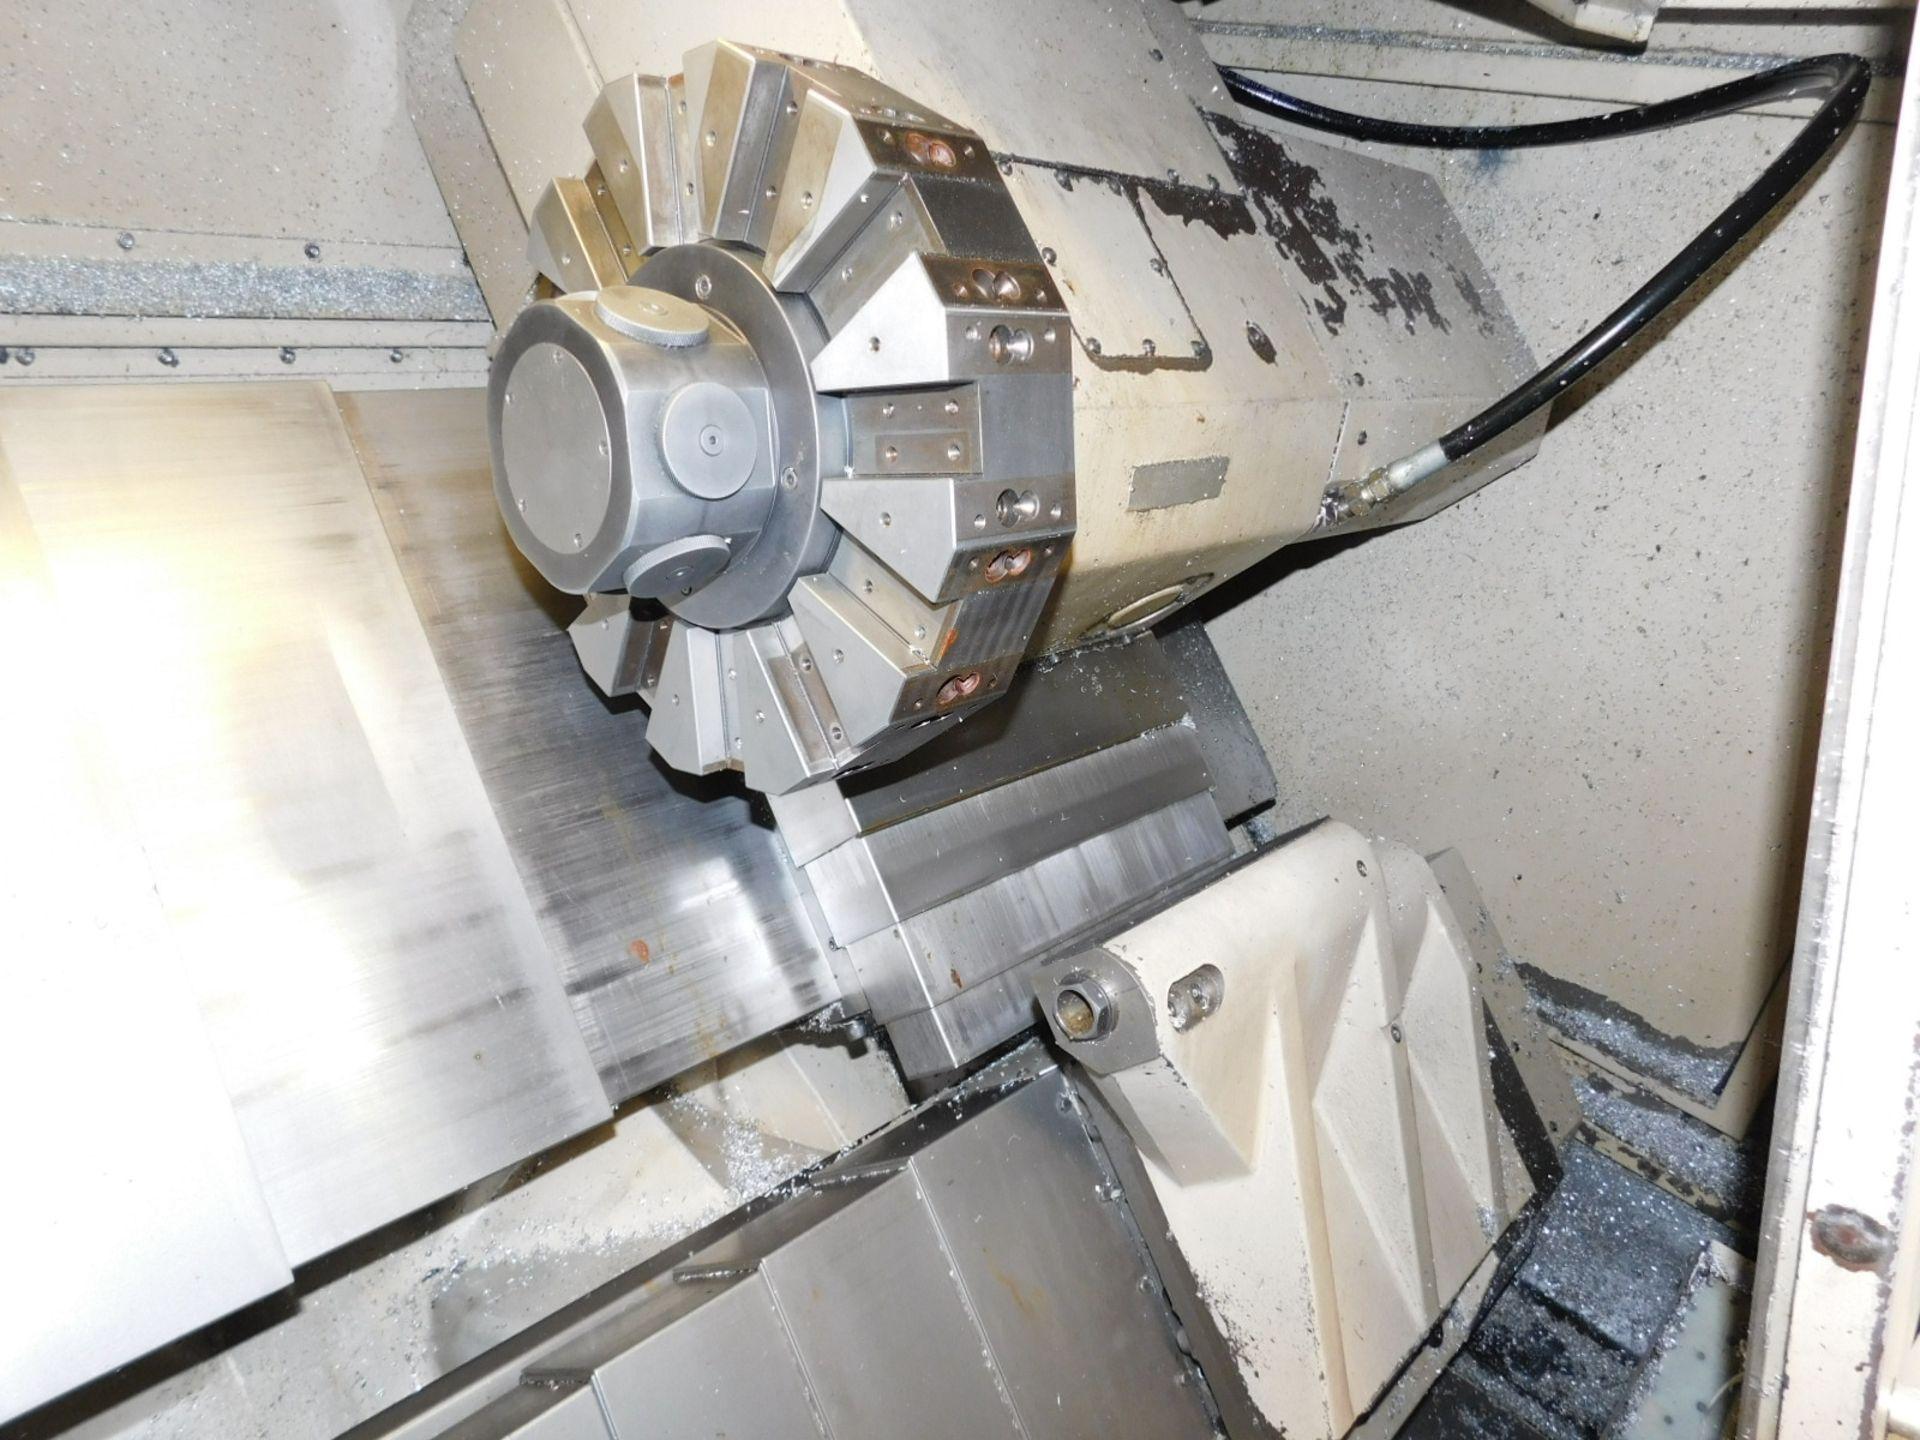 HARDINGE CONQUEST T-42 CNC LATHE, MODEL SG42, FANUC 18-T CNC CONTROL, 12-STATION TURRET, - Image 8 of 27